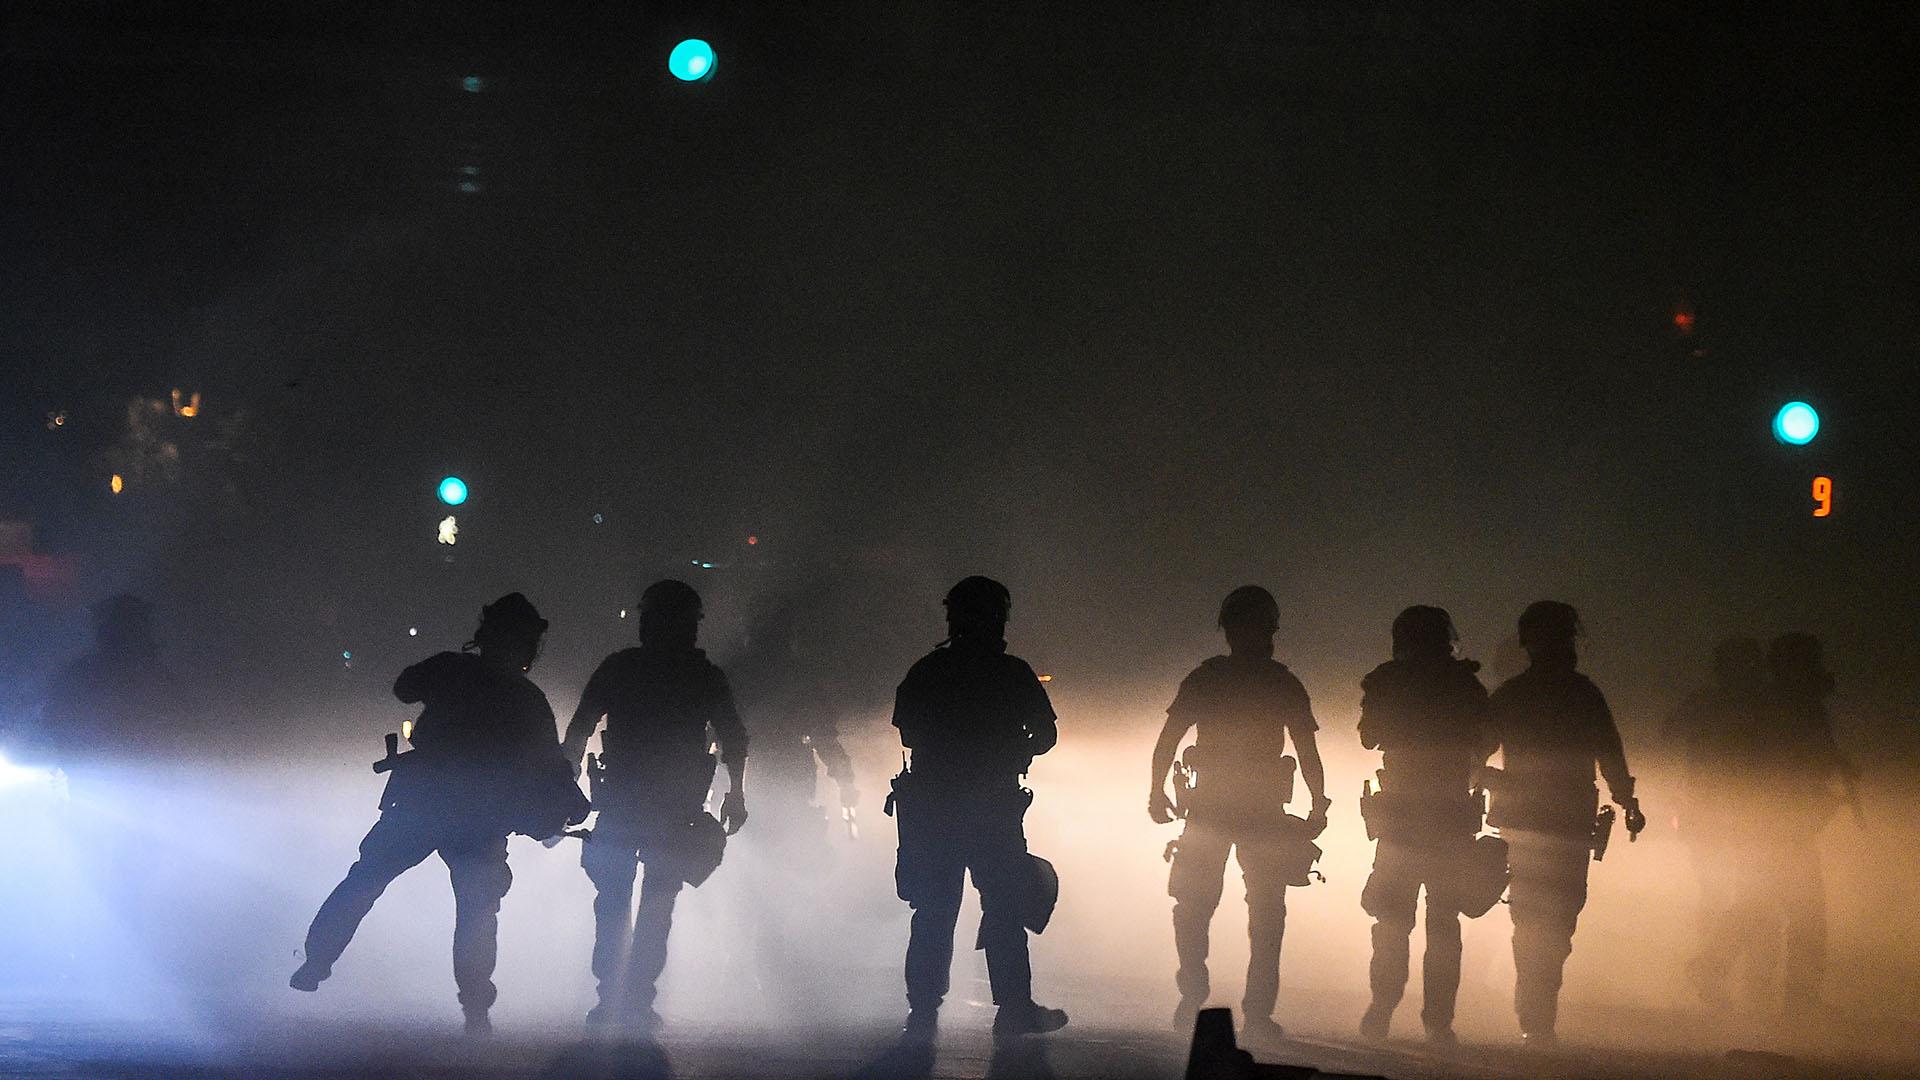 Policías reprimen una protesta en Minneapolis, Minnesota (Chandan KHANNA / AFP)